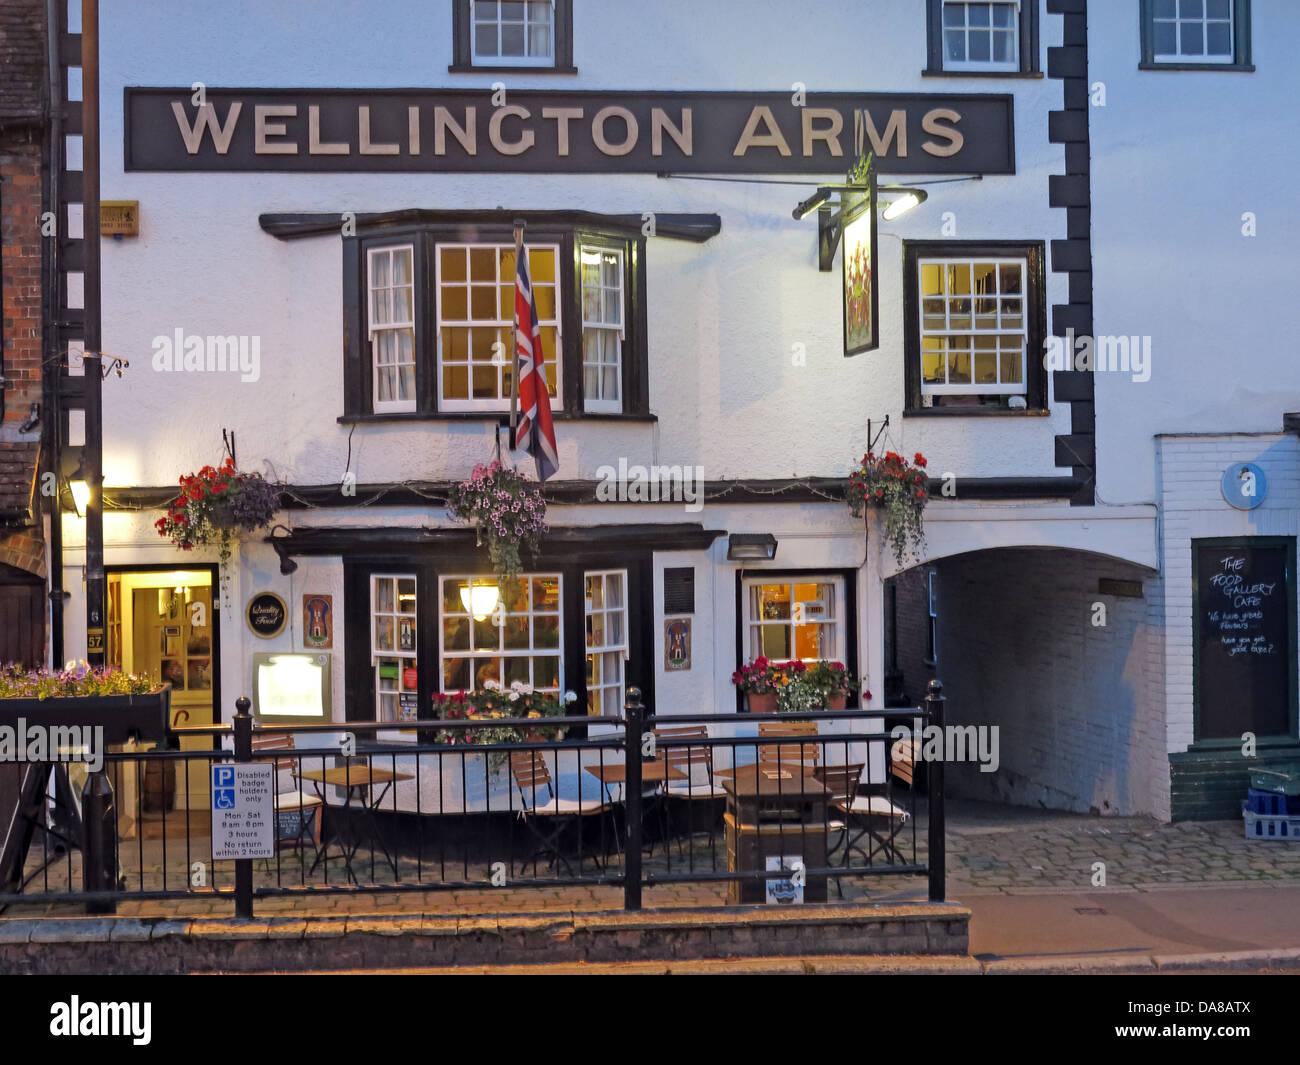 The Wellington Arms, 46 High St, Marlborough SN8 1HQ  at dusk - Stock Image